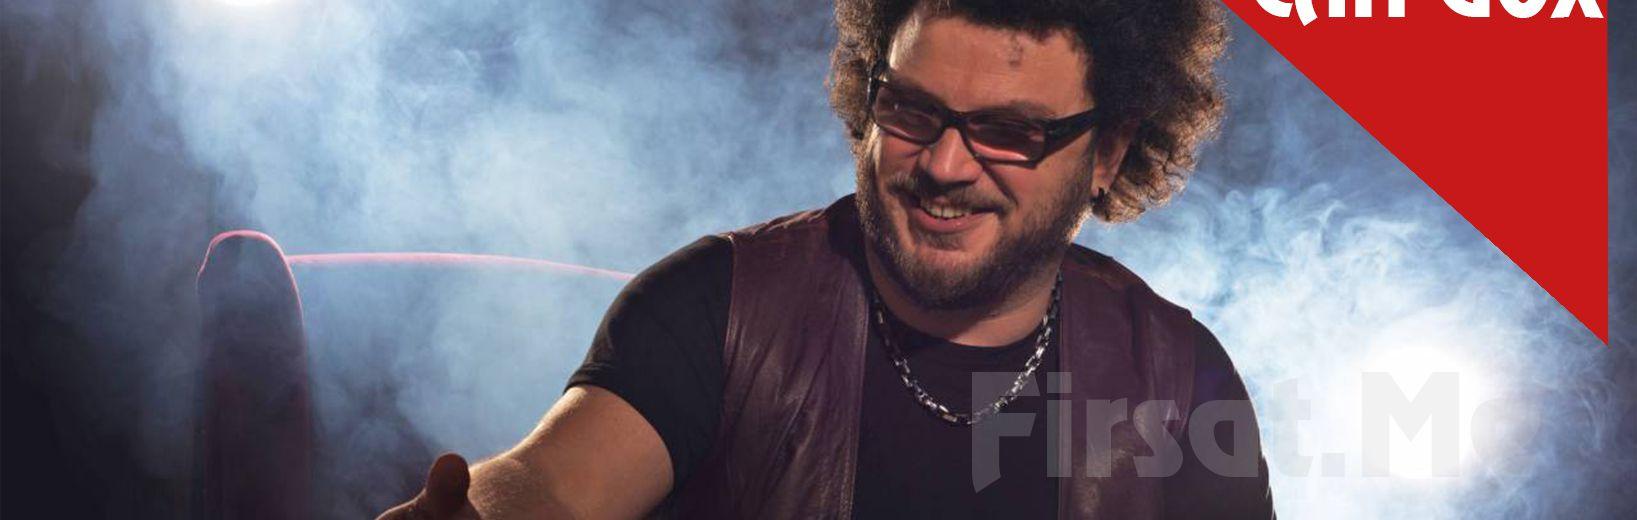 Beyrut Performance Kartal Sahne'de 8 Şubat'ta Can Gox Konser Bileti